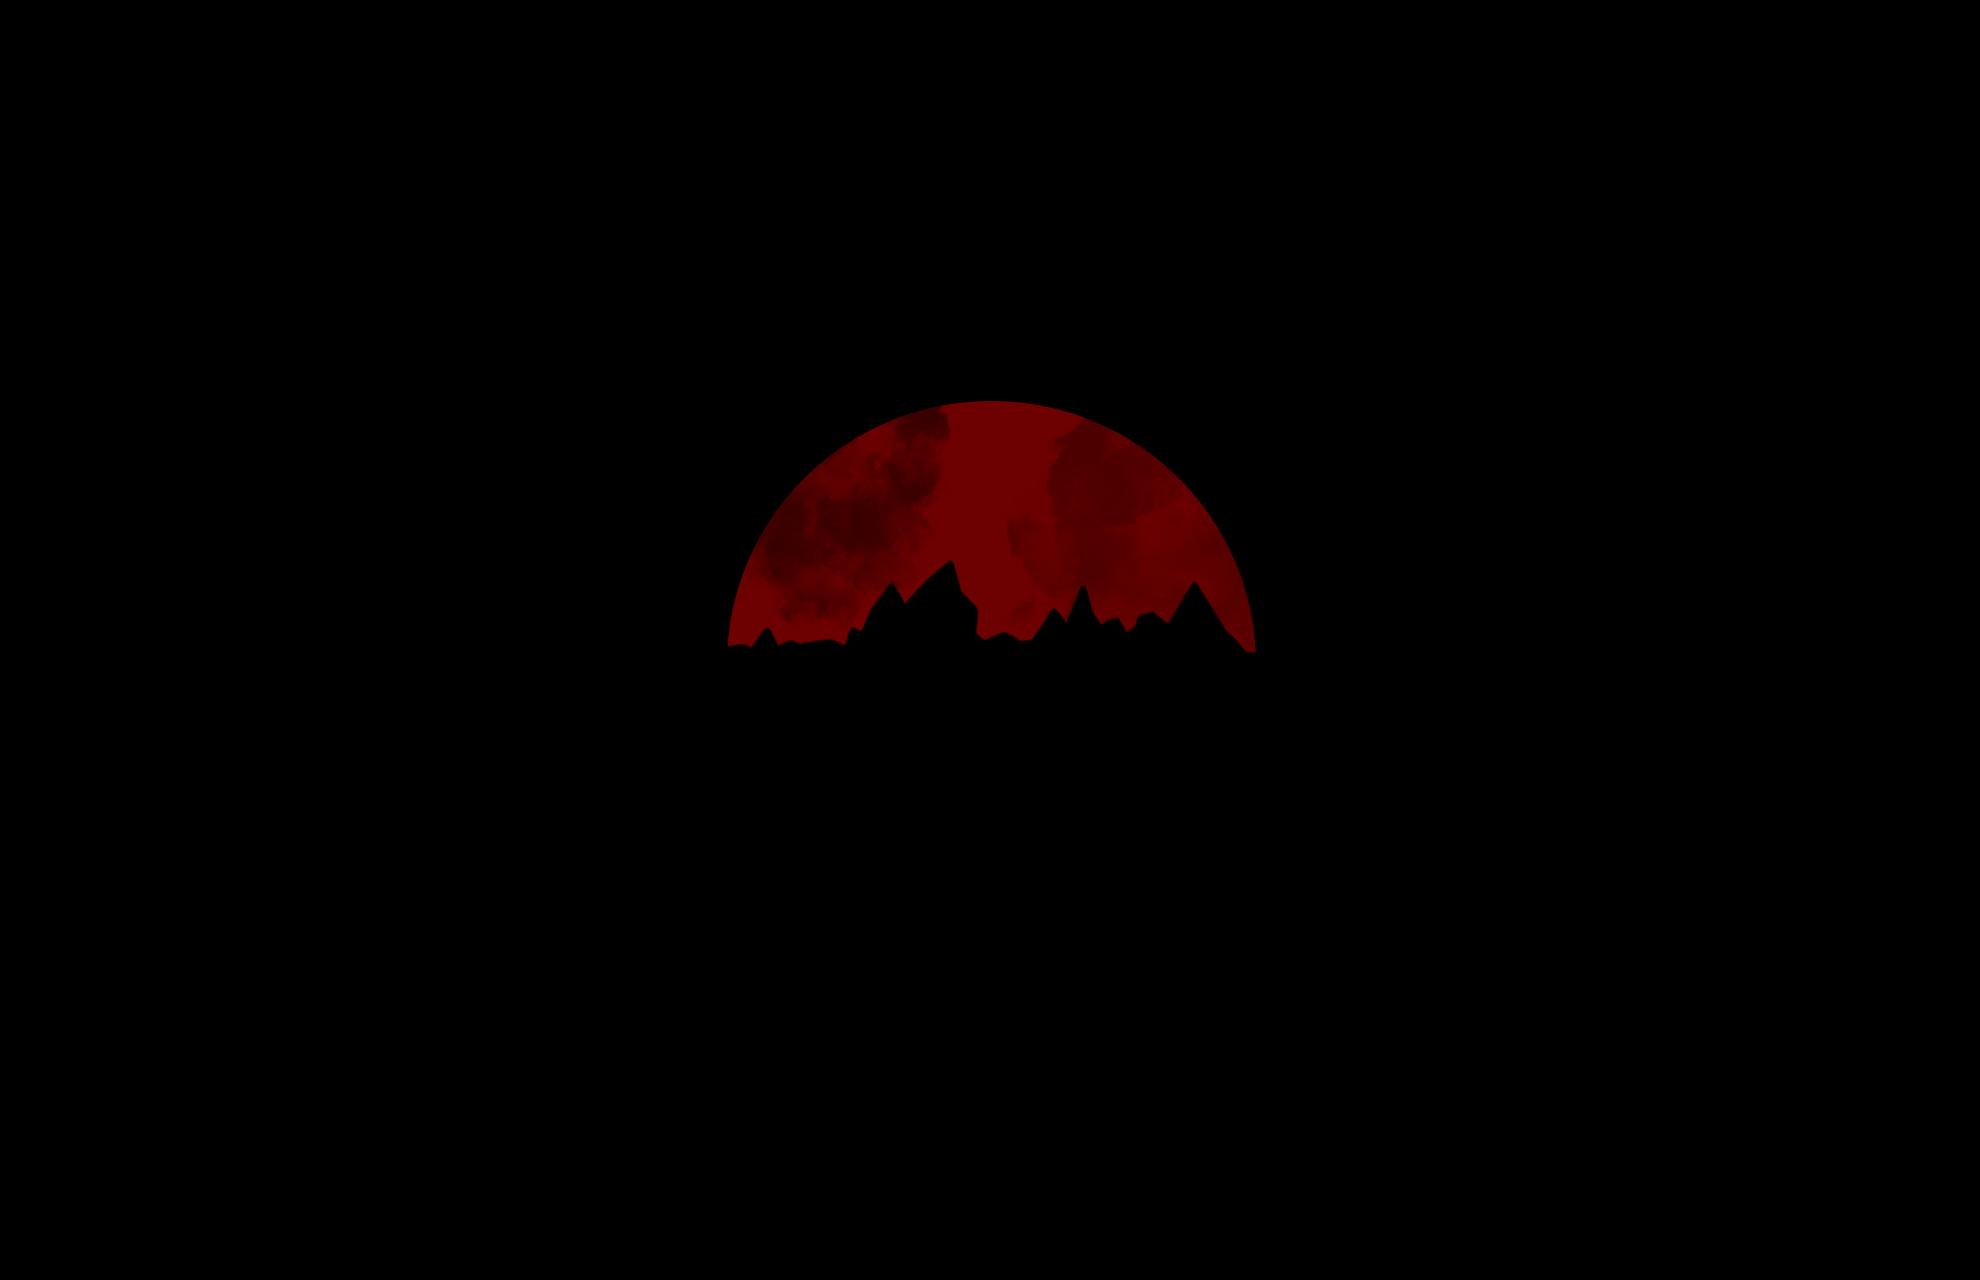 Wallpaper Simple Minimalism Black Background Red Dark Artwork Red Moon 1980x1280 Darkredman 1820829 Hd Wallpapers Wallhere